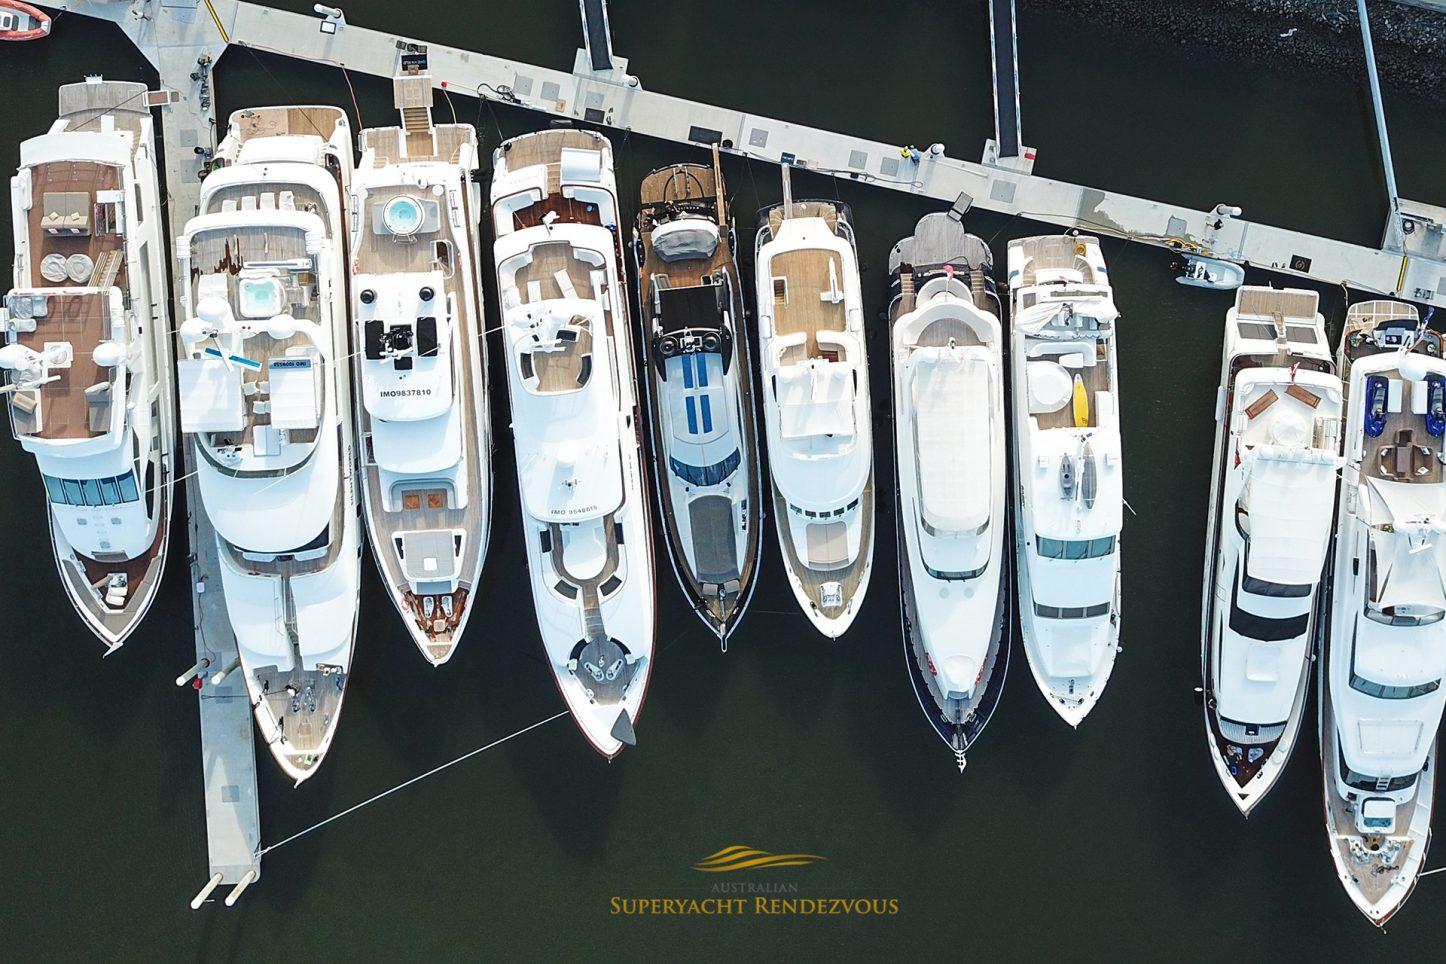 Australian Superyacht Rendezvous Joins the KRSR as Partner